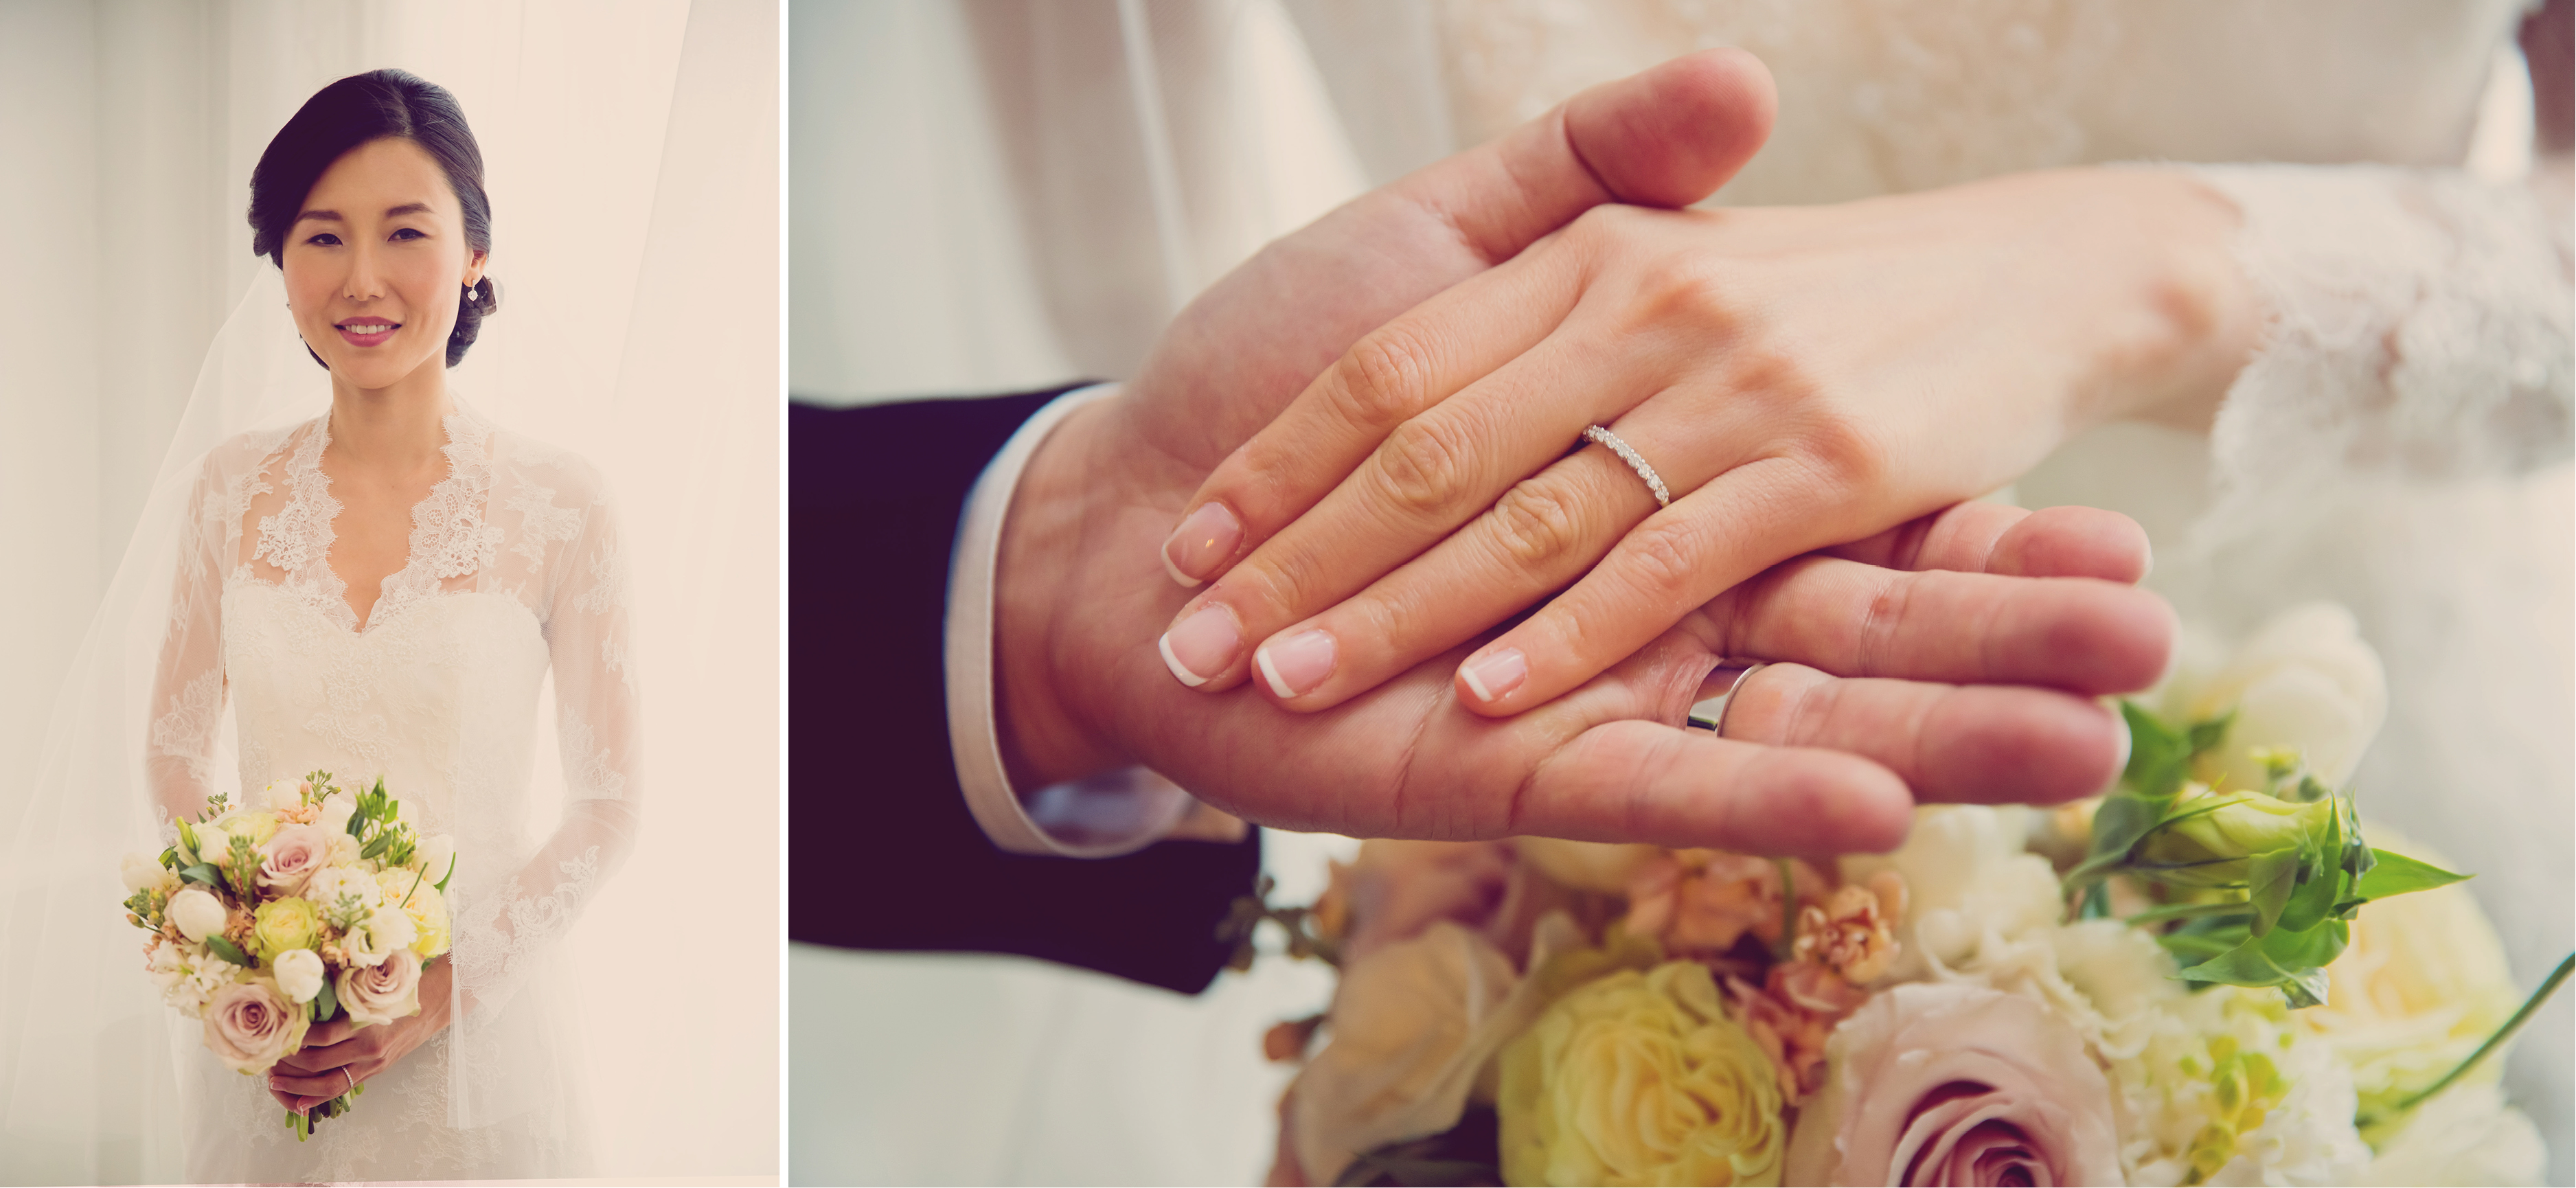 Emma_cleary_photography ici wedding13